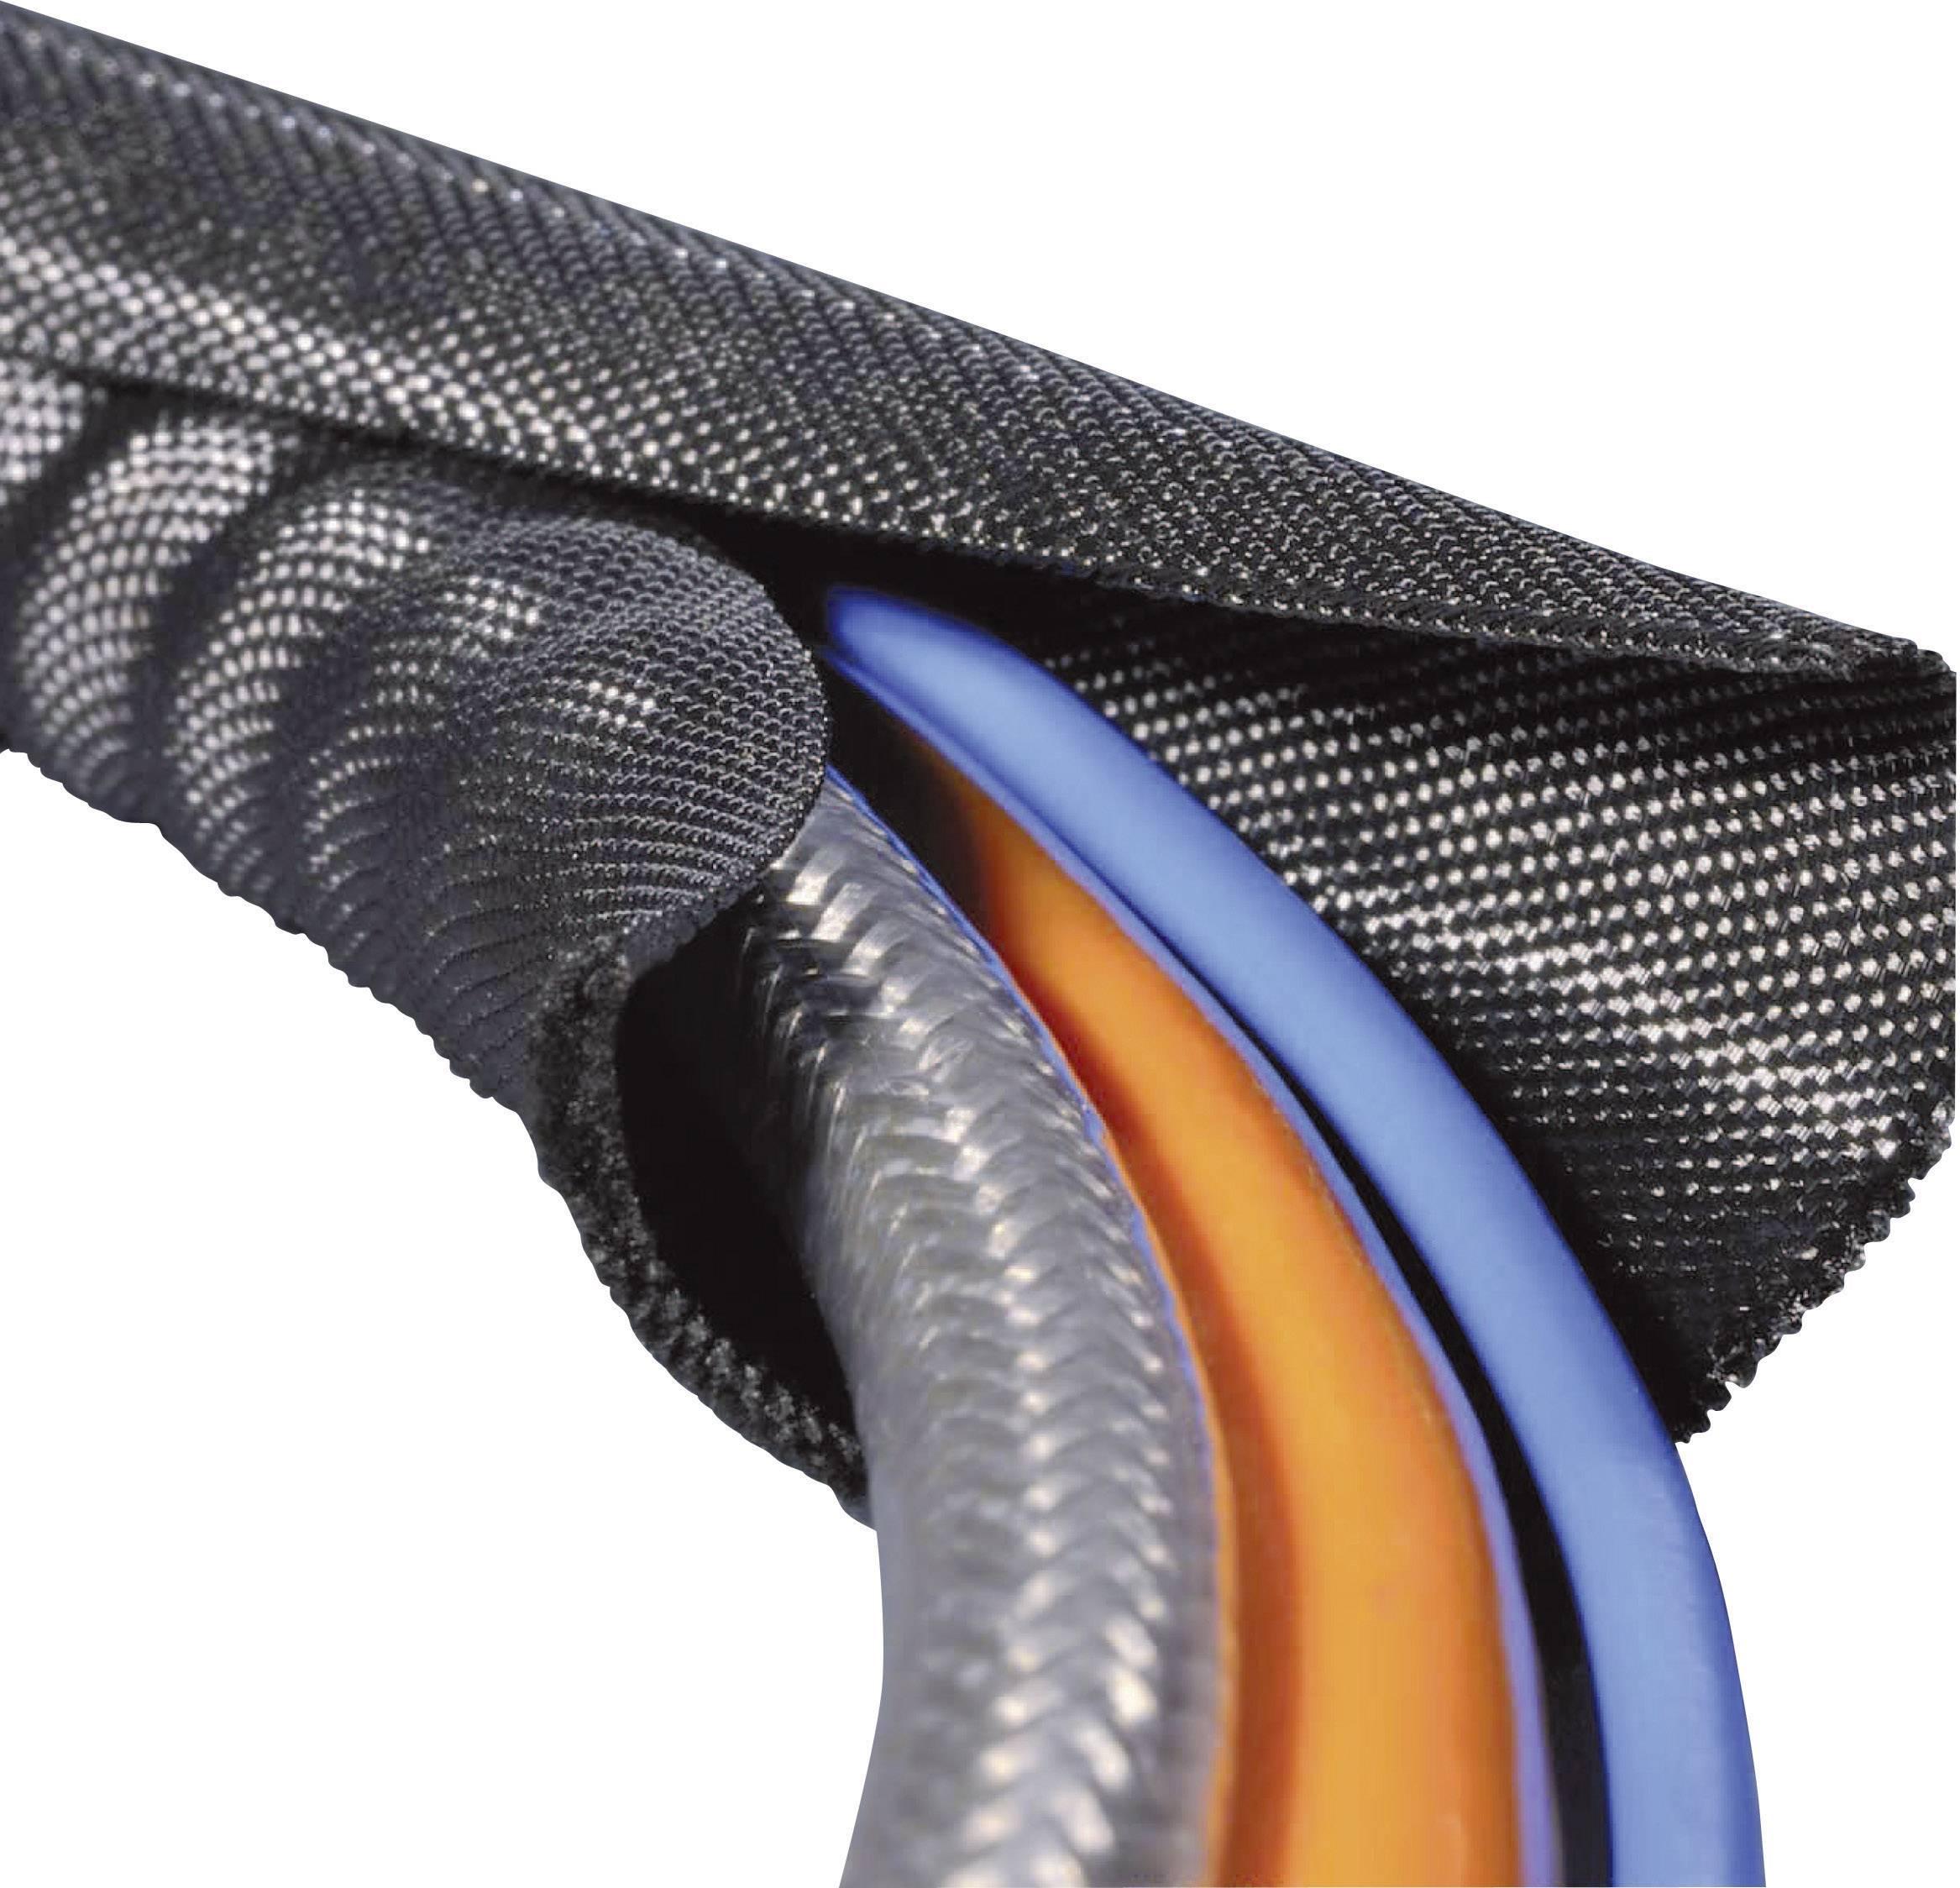 Ochranný oplet HellermannTyton Twist-In 25, 19 do 25 mm, -70 do +125 °C, metrový tovar, čierna